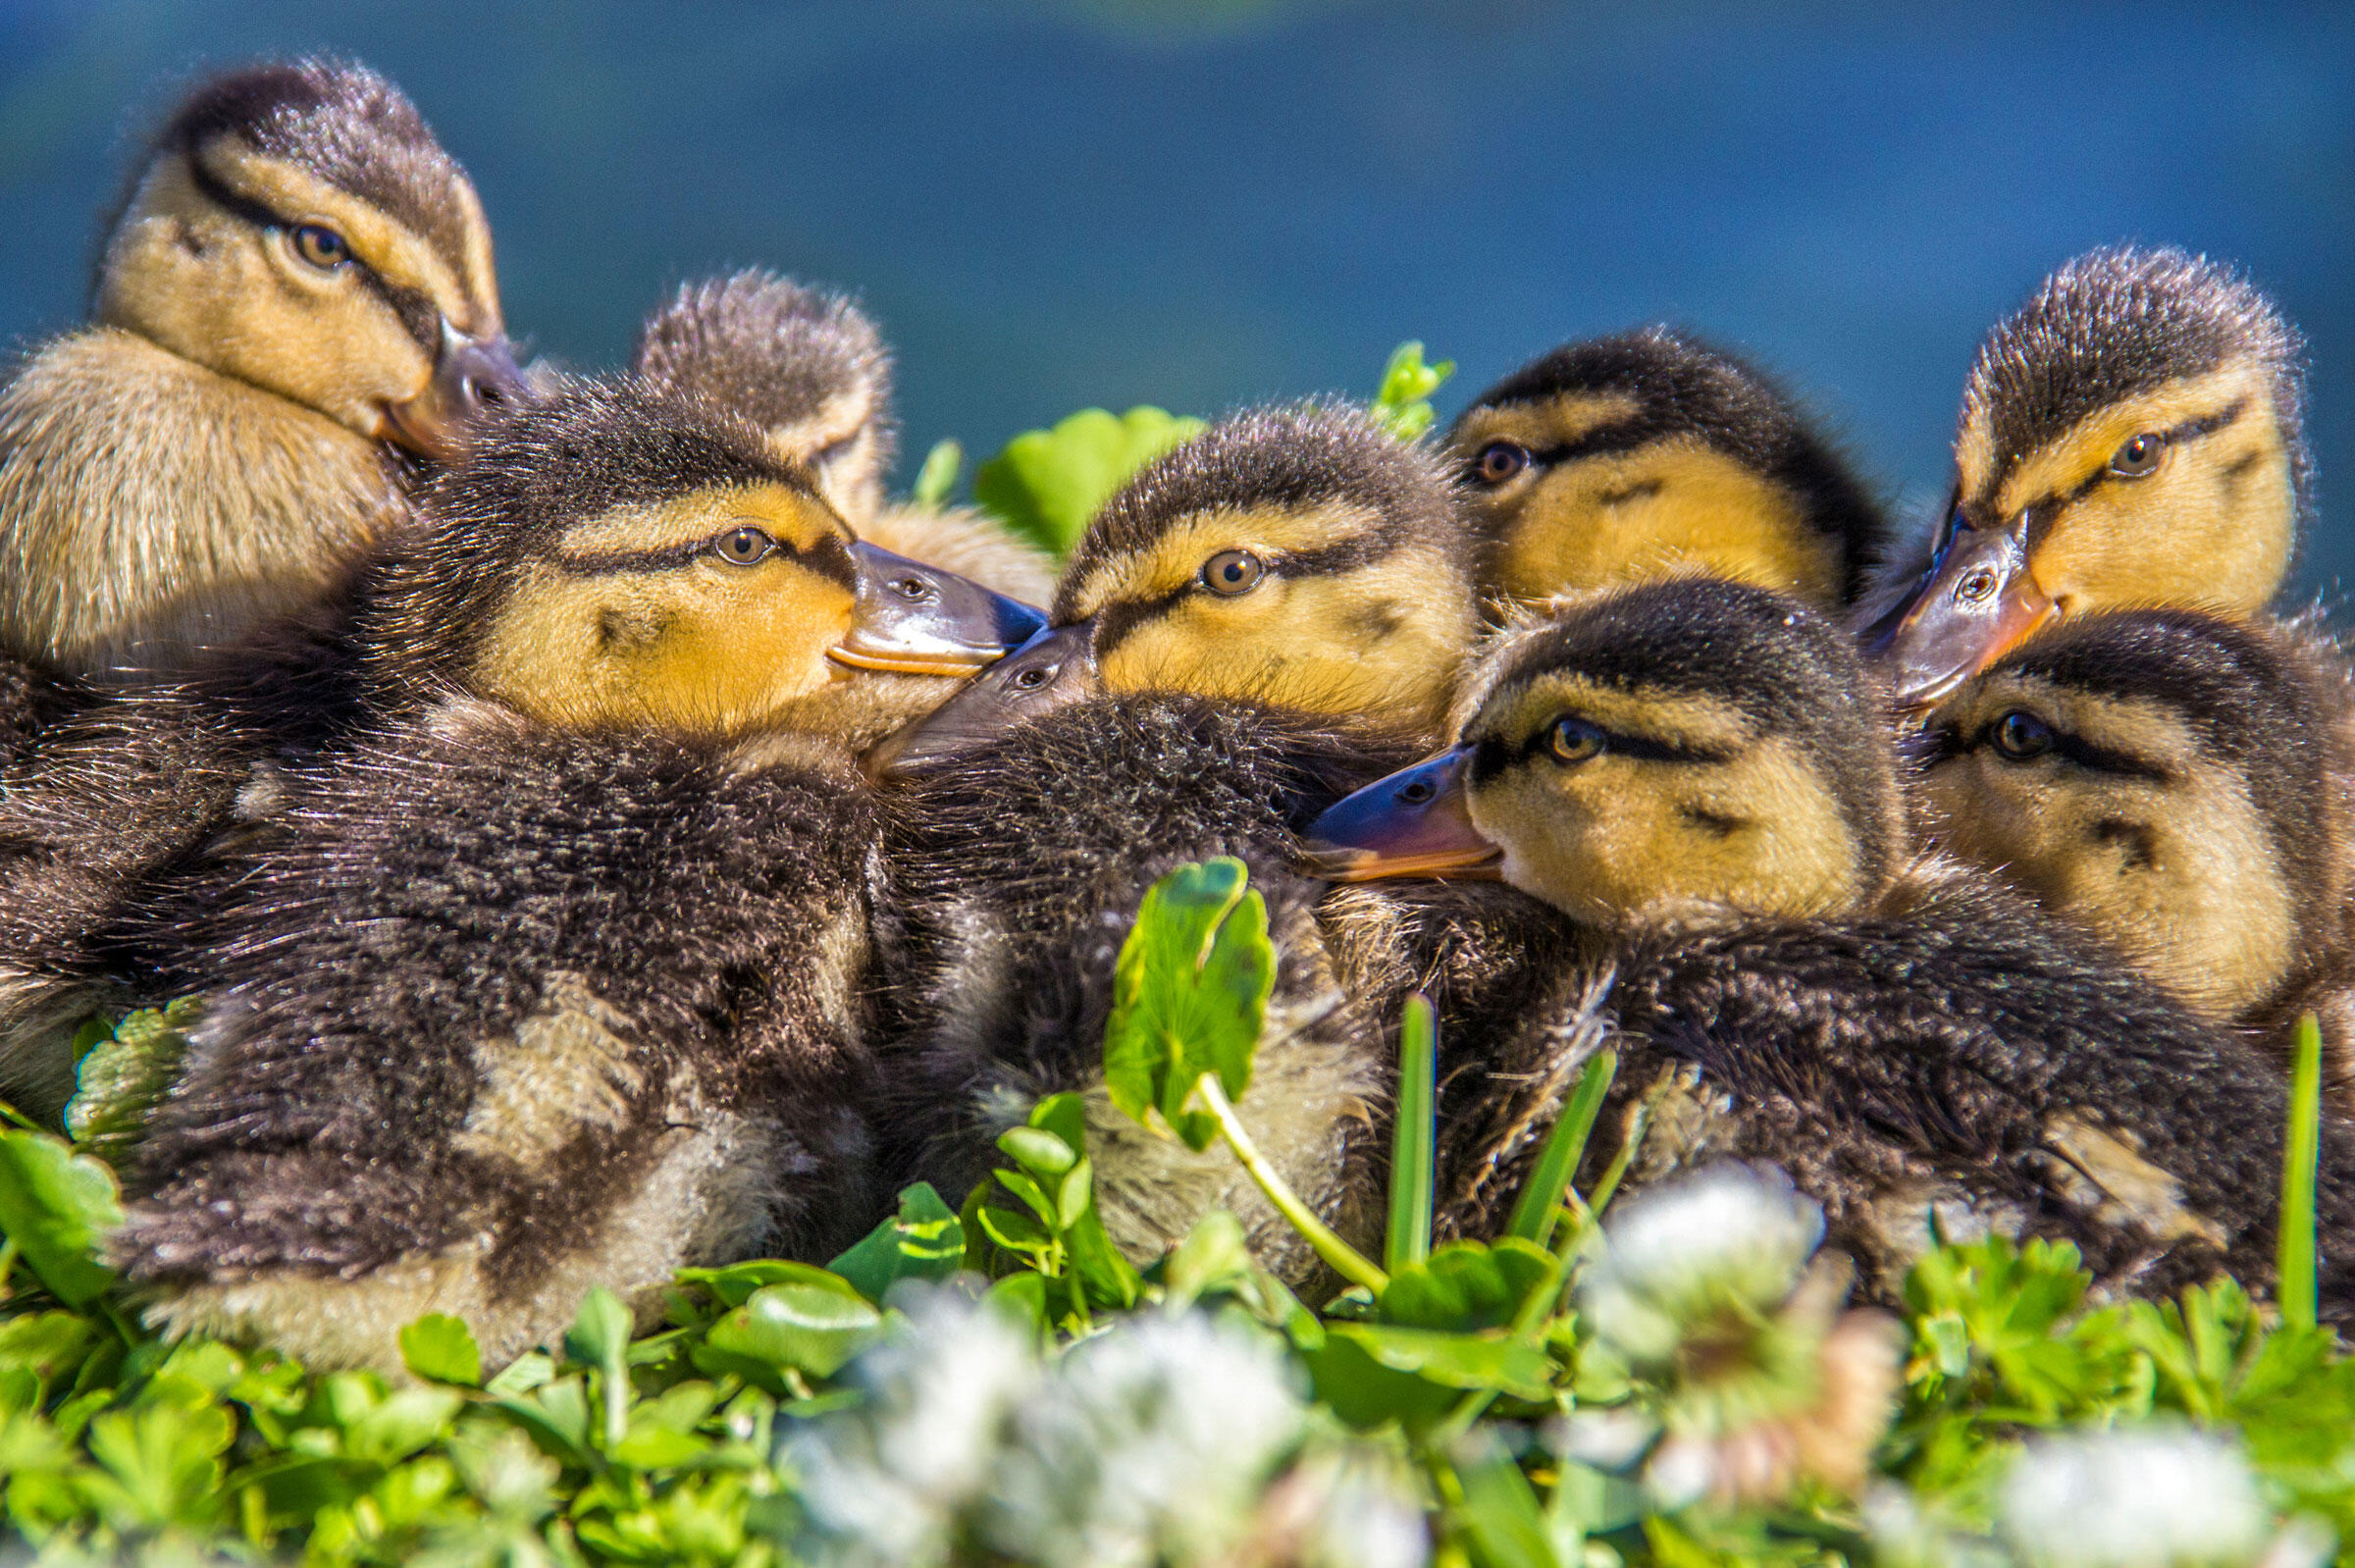 Ducklings/Amateur Category. Terry Godbey/Audubon Photography Awards